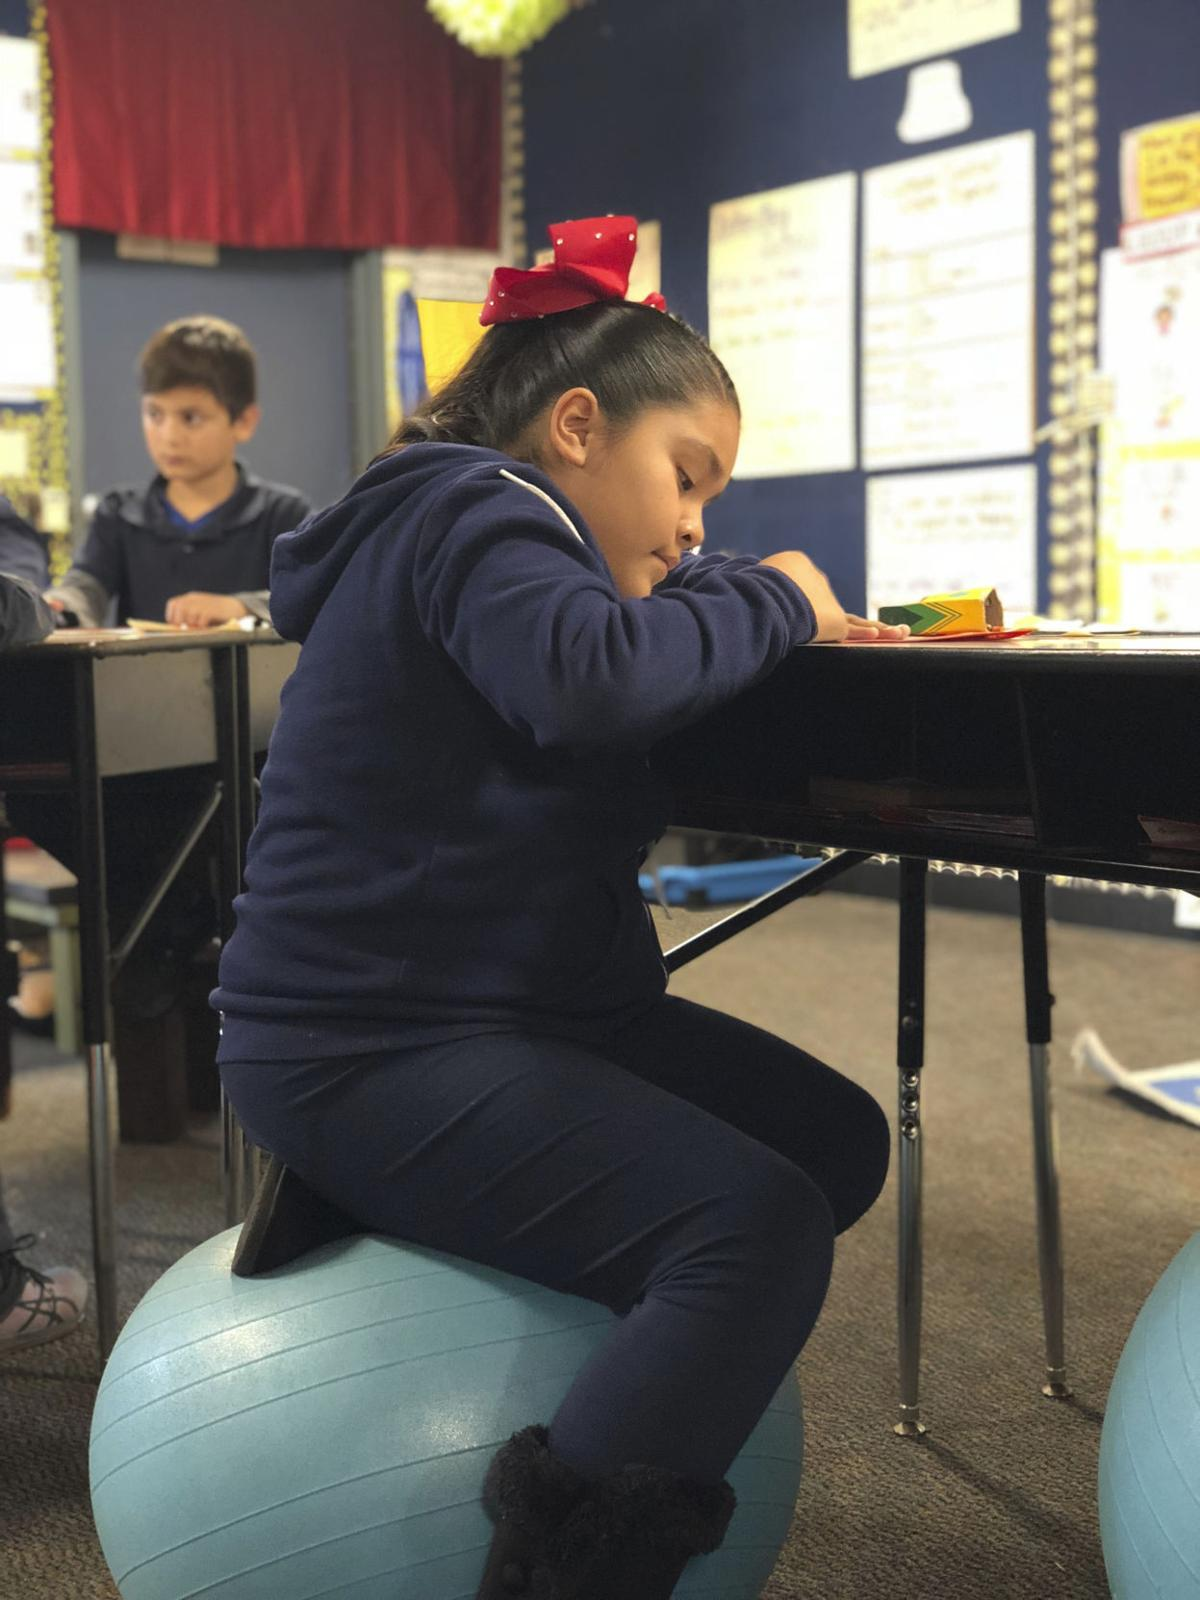 2 - Back To School Classroom Design